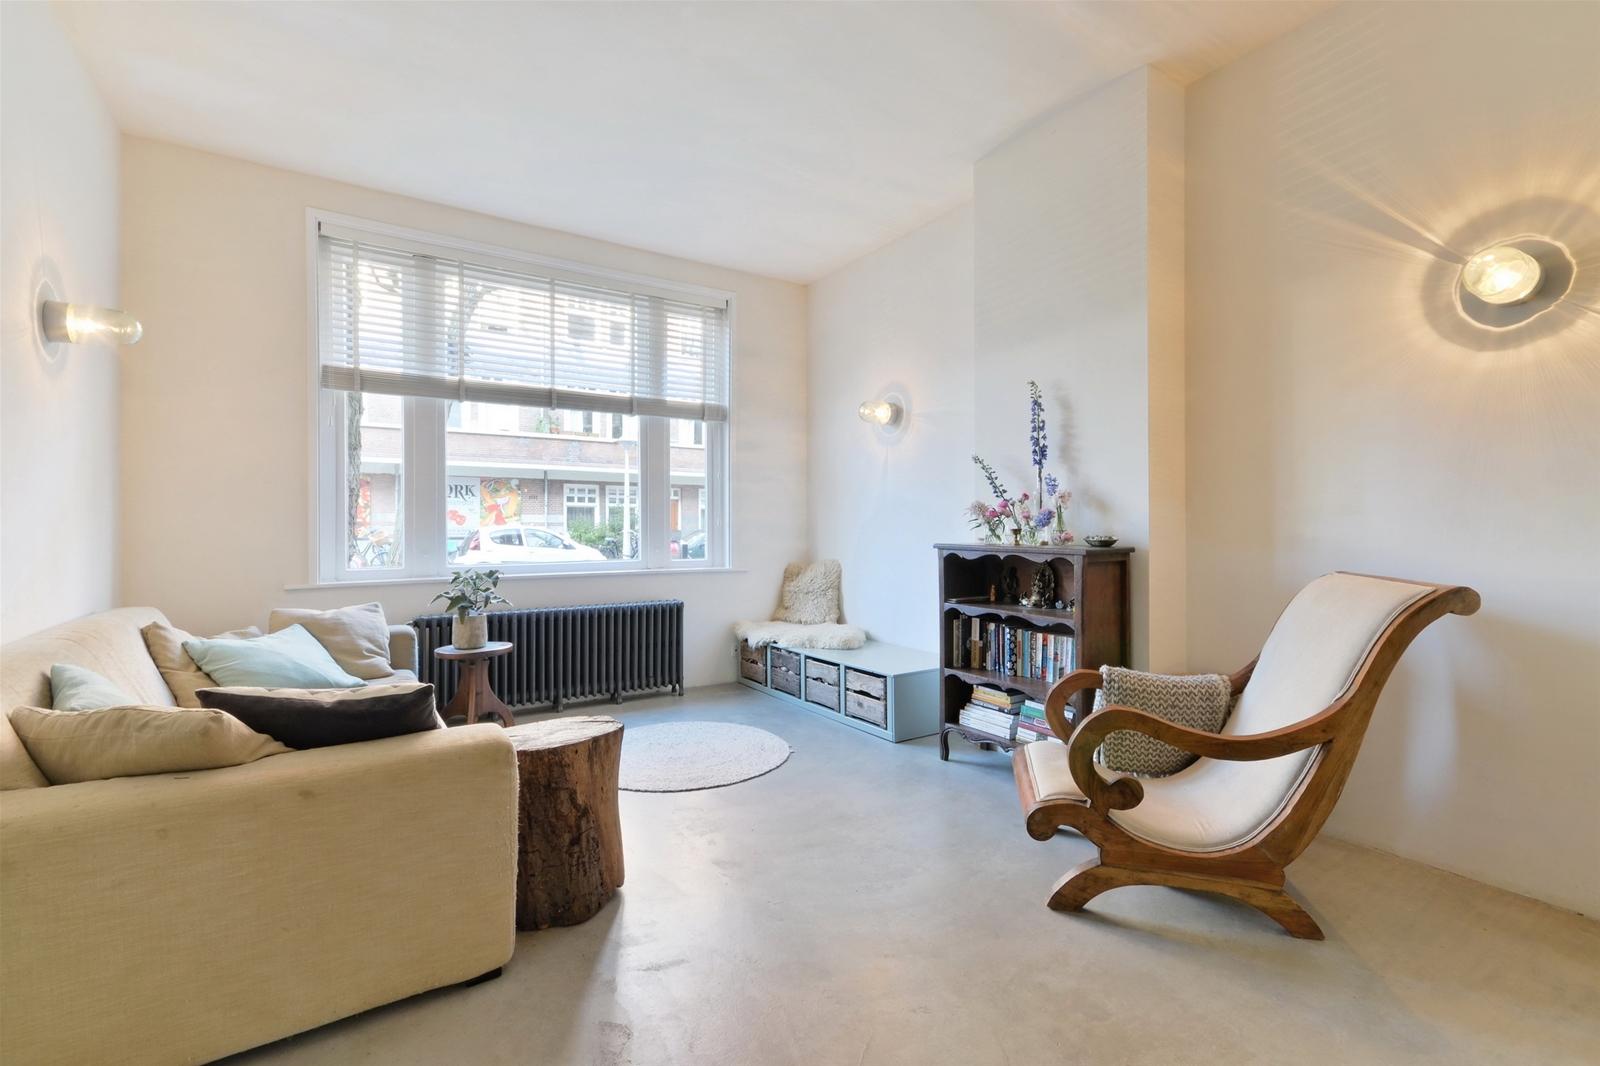 Stoere woonkamer van jaren \'30 benedenwoning | HOMEASE